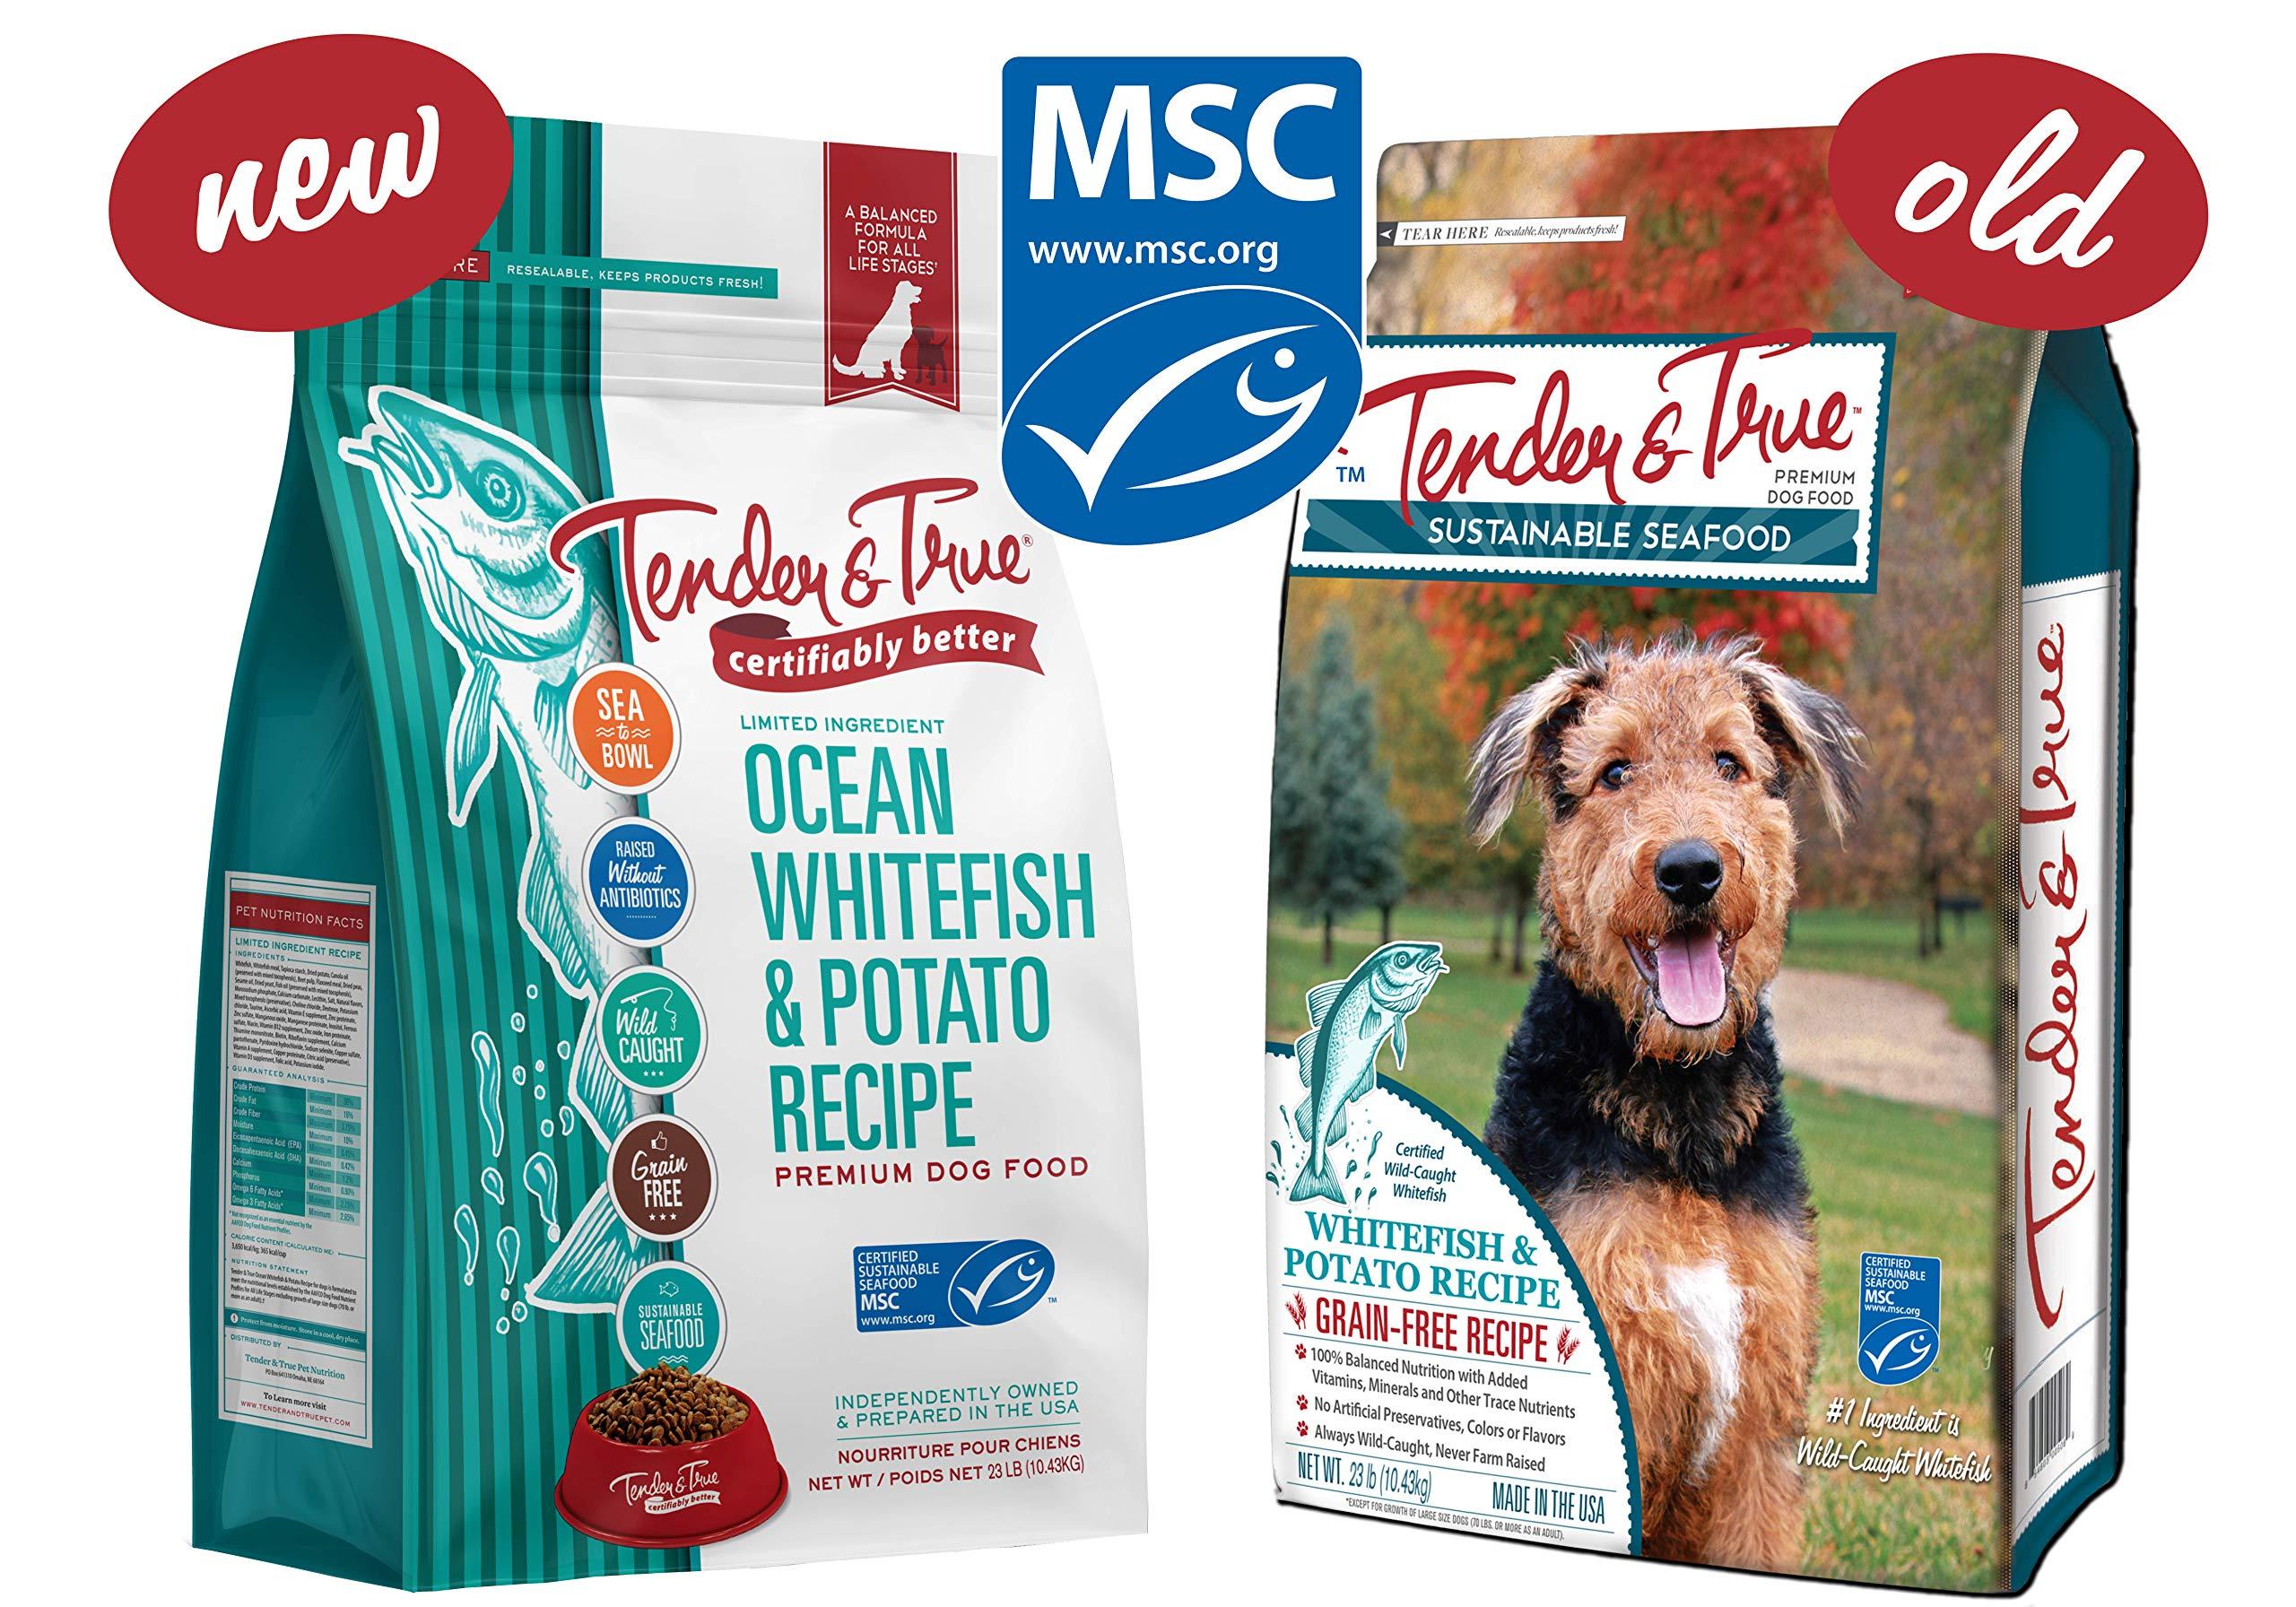 Tender & True Ocean Whitefish & Potato Recipe Dog Food, 23 lb by Tender & True Pet Nutrition